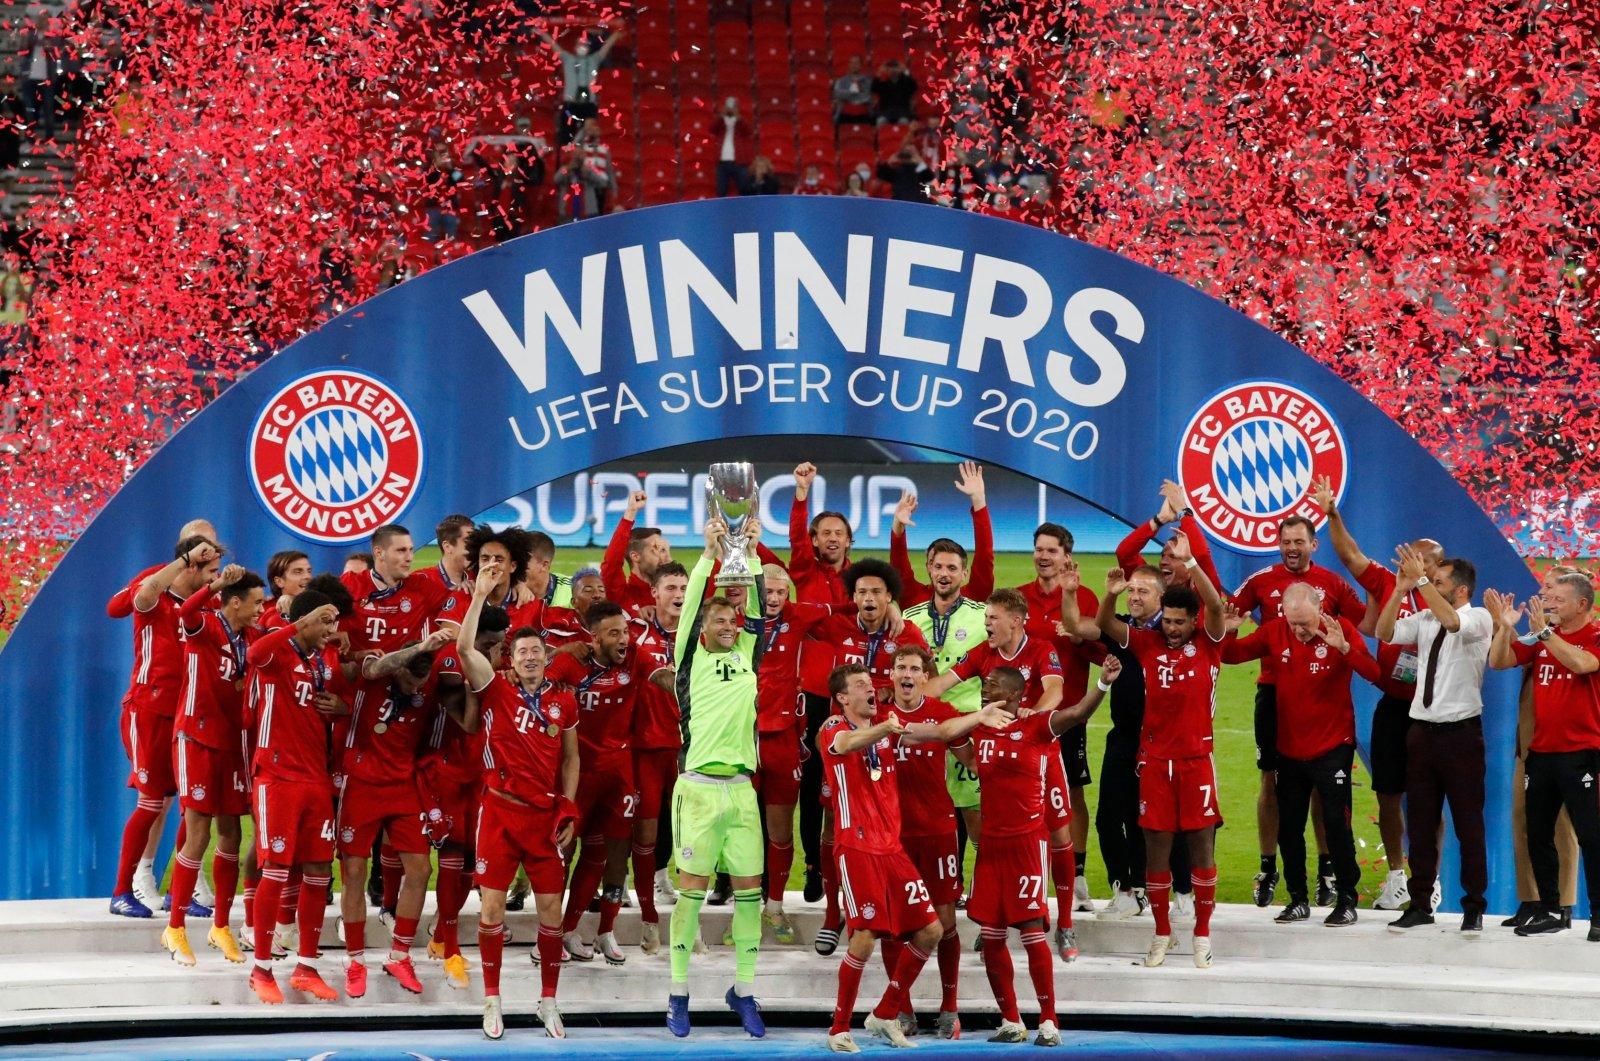 Ini bukti cristiano ronaldo raja liga champions,. Quadruple kings: Bayern downs Sevilla to lift UEFA Super ...